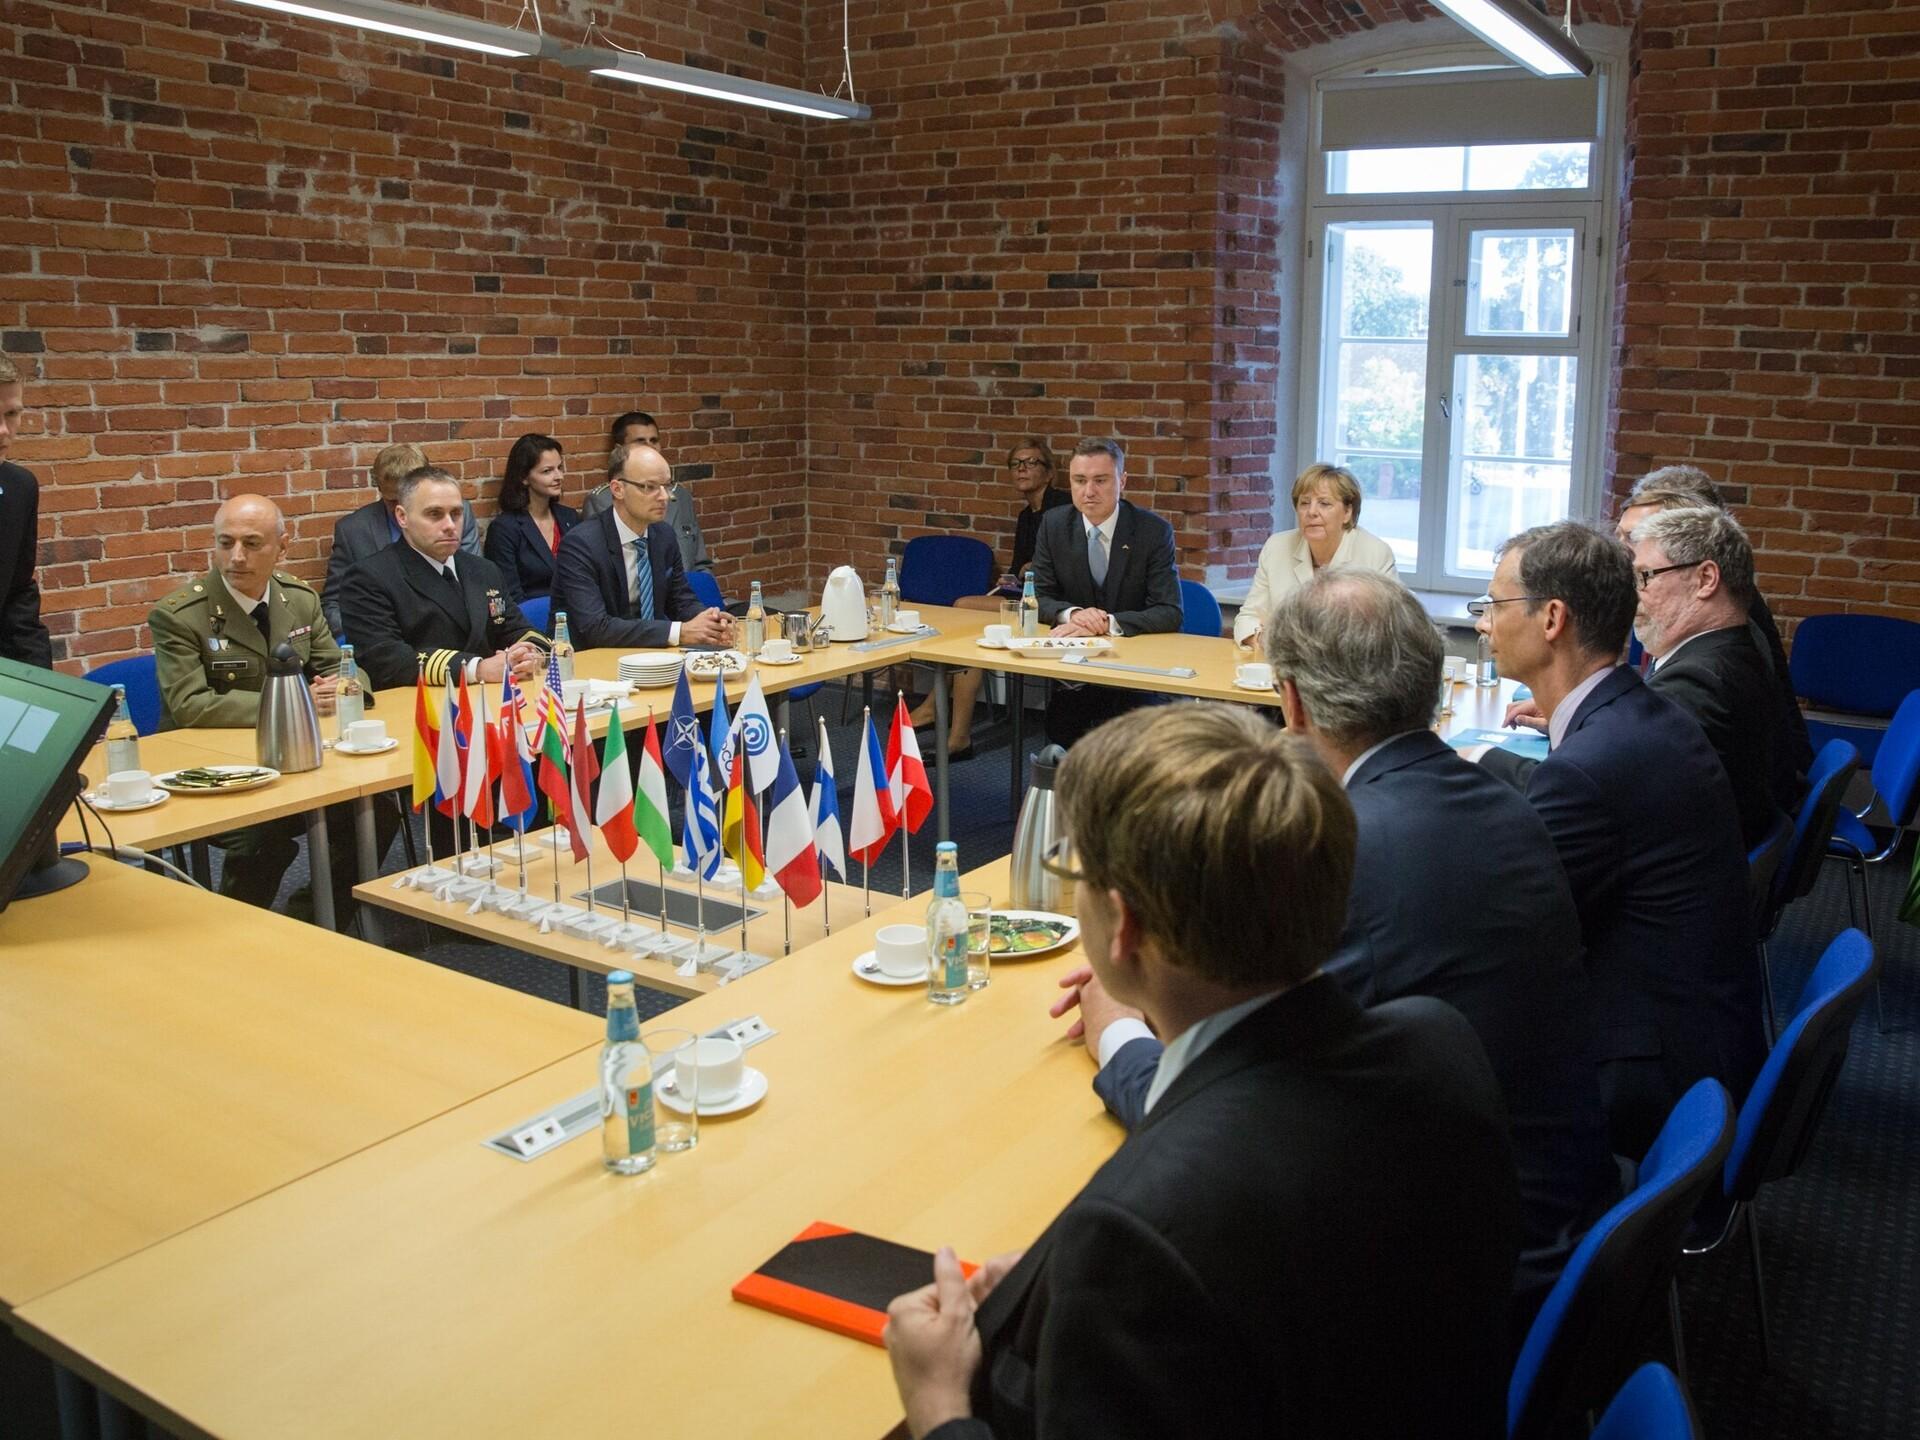 Merkel briefed on recent developments in cyber defense   News   ERR